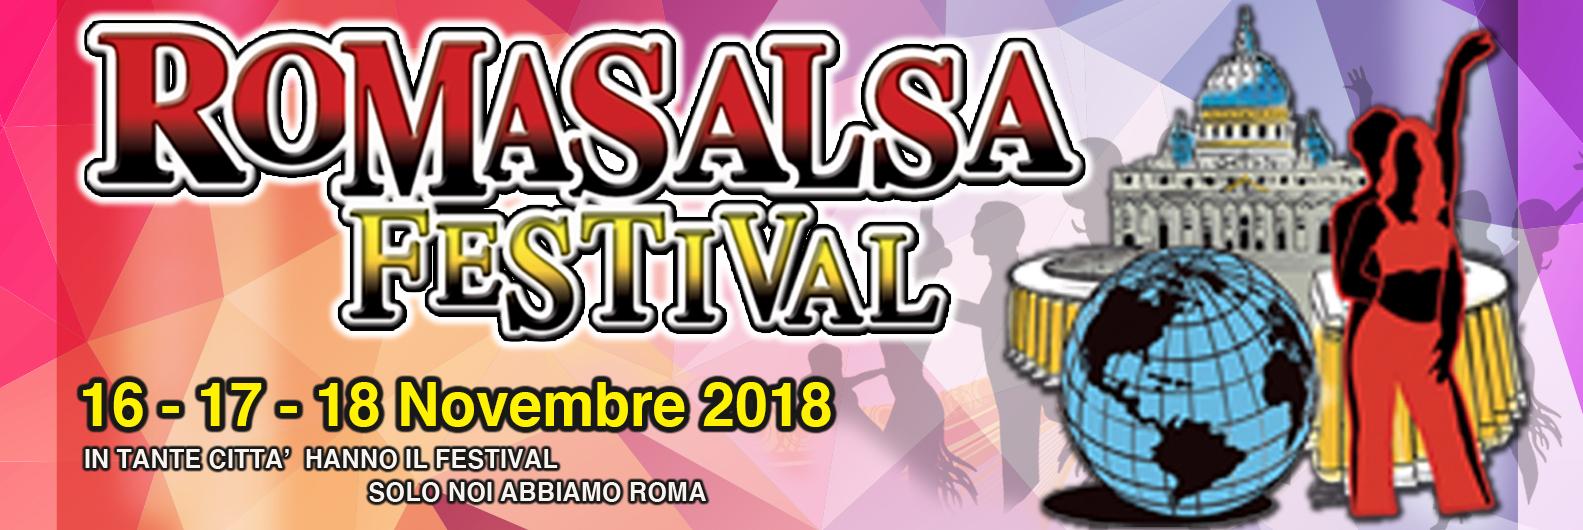 roma-salsa-festival-sito-homepage-pag-1-2017